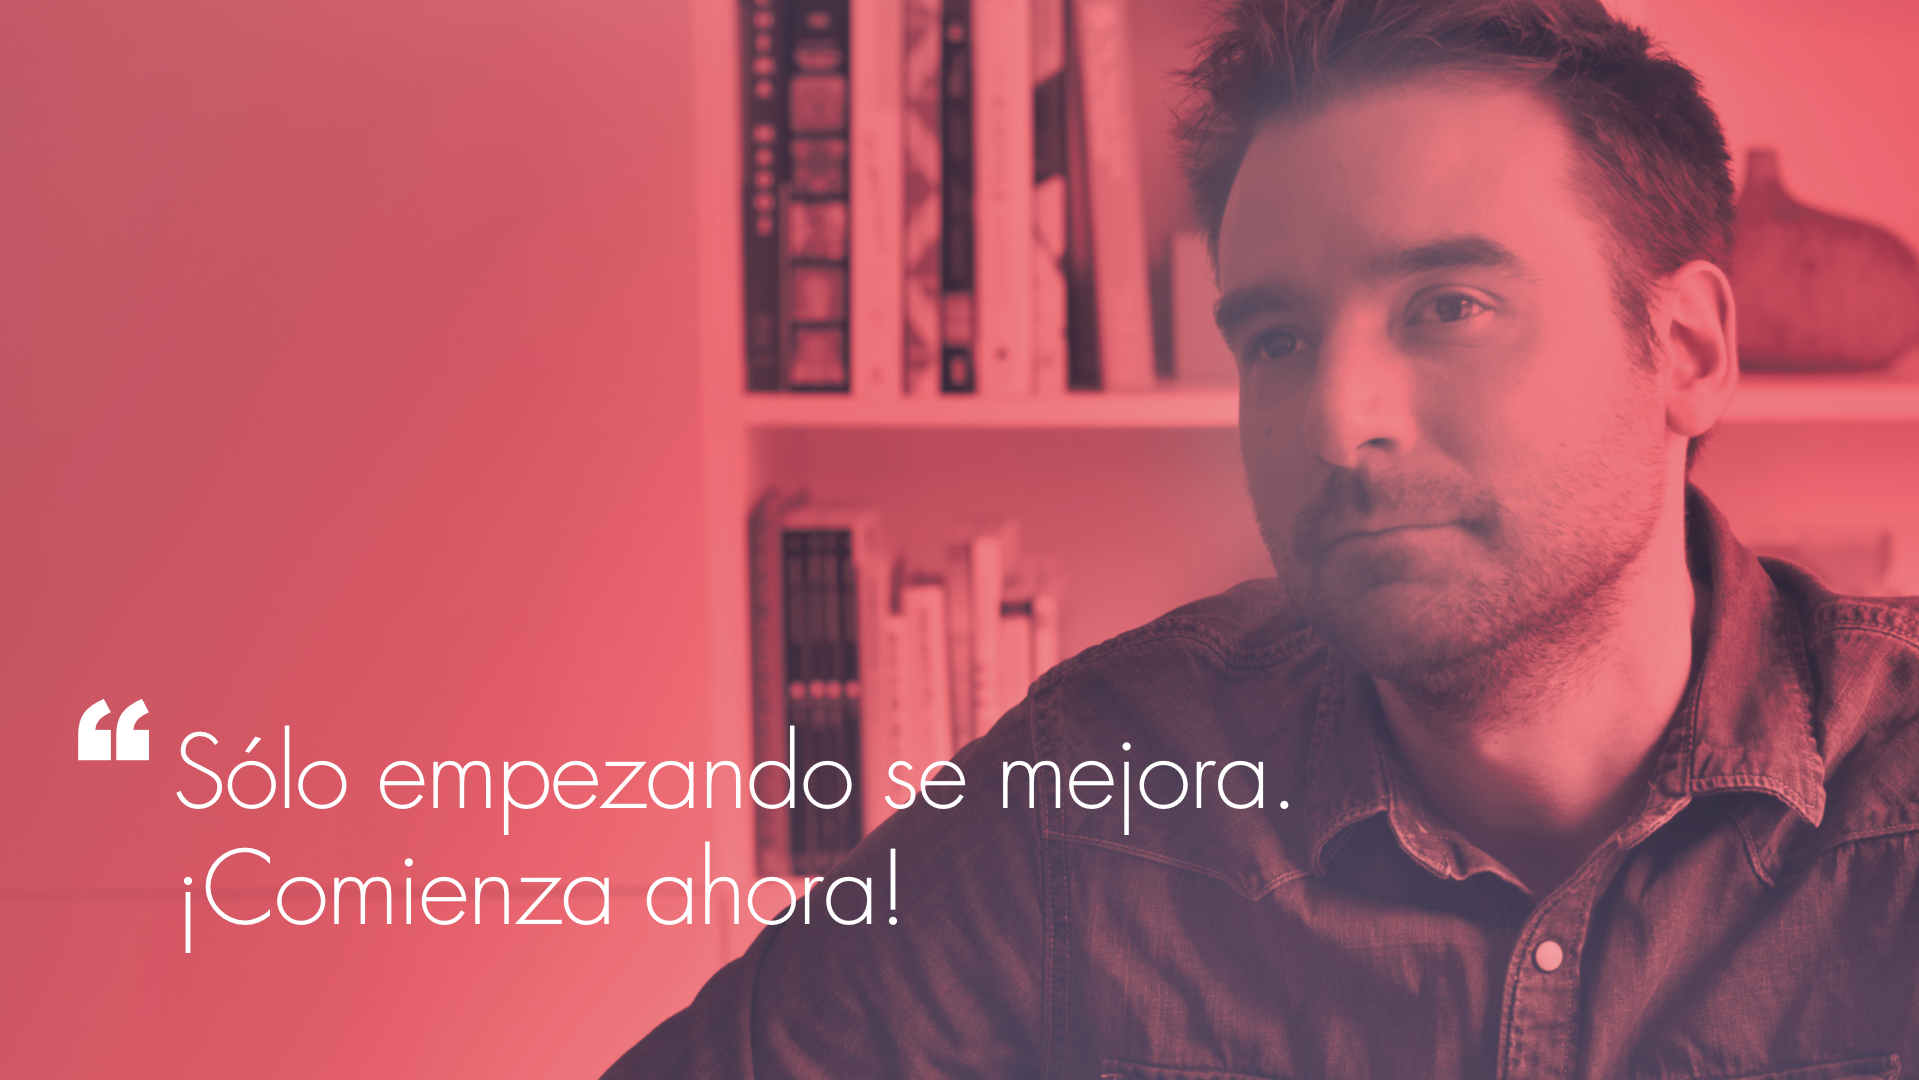 Samu Parra - Experto en Branding y Copywriting